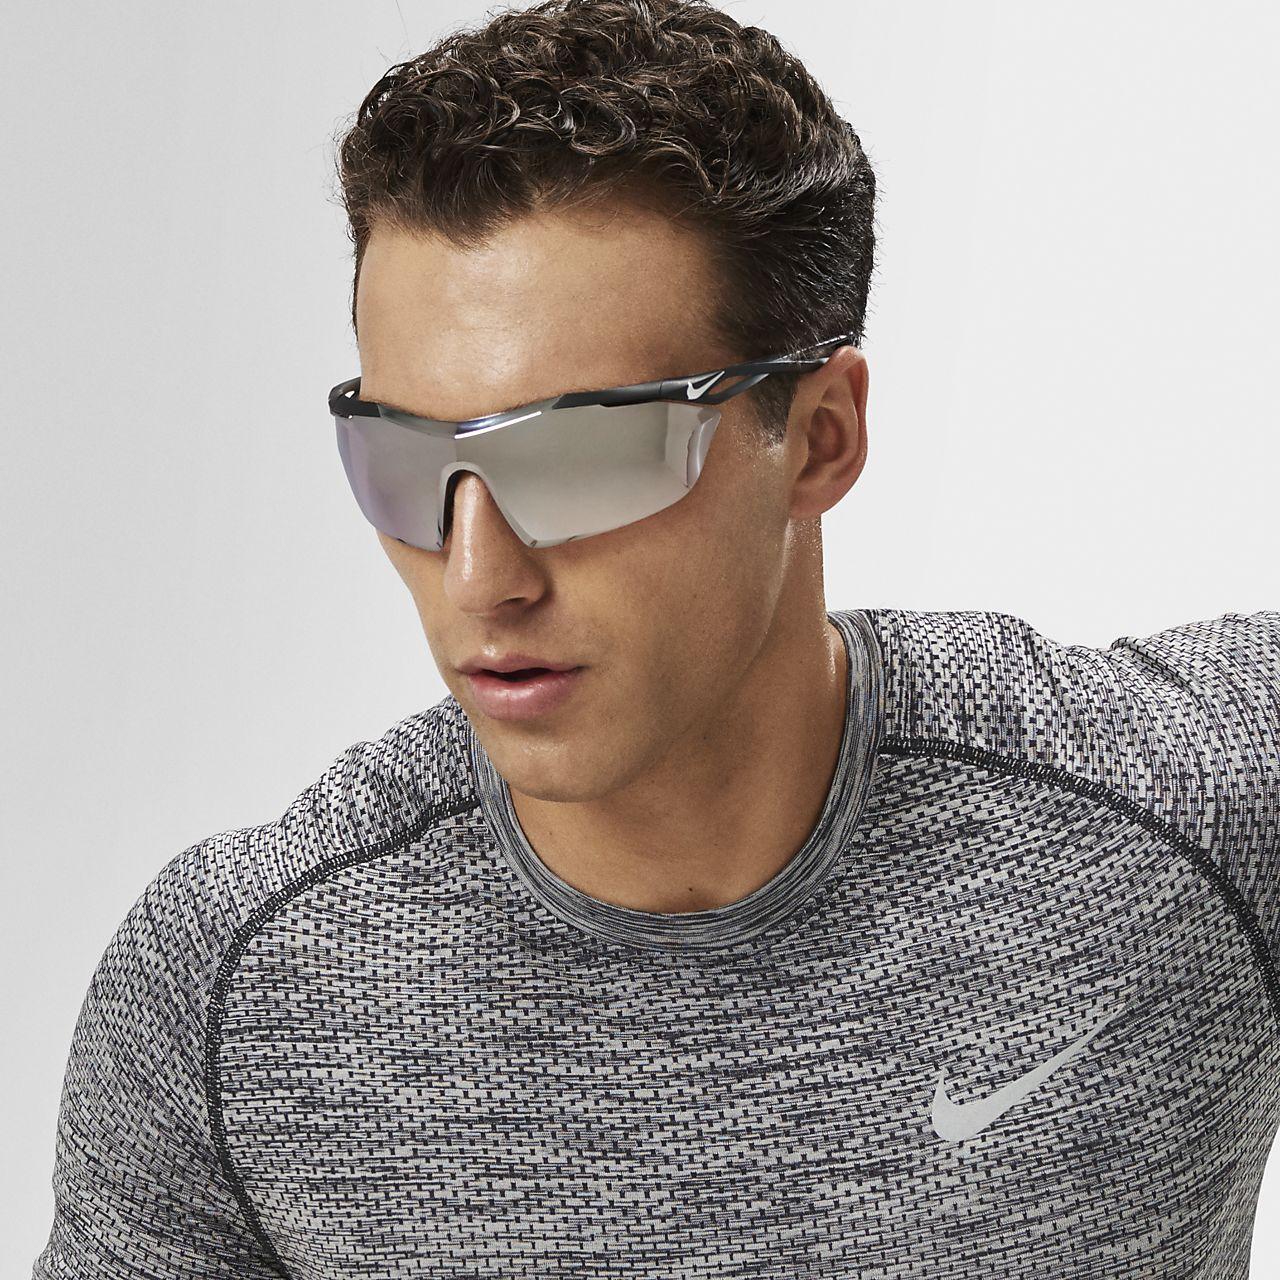 ... Nike Vaporwing Elite Speed Tint Sunglasses